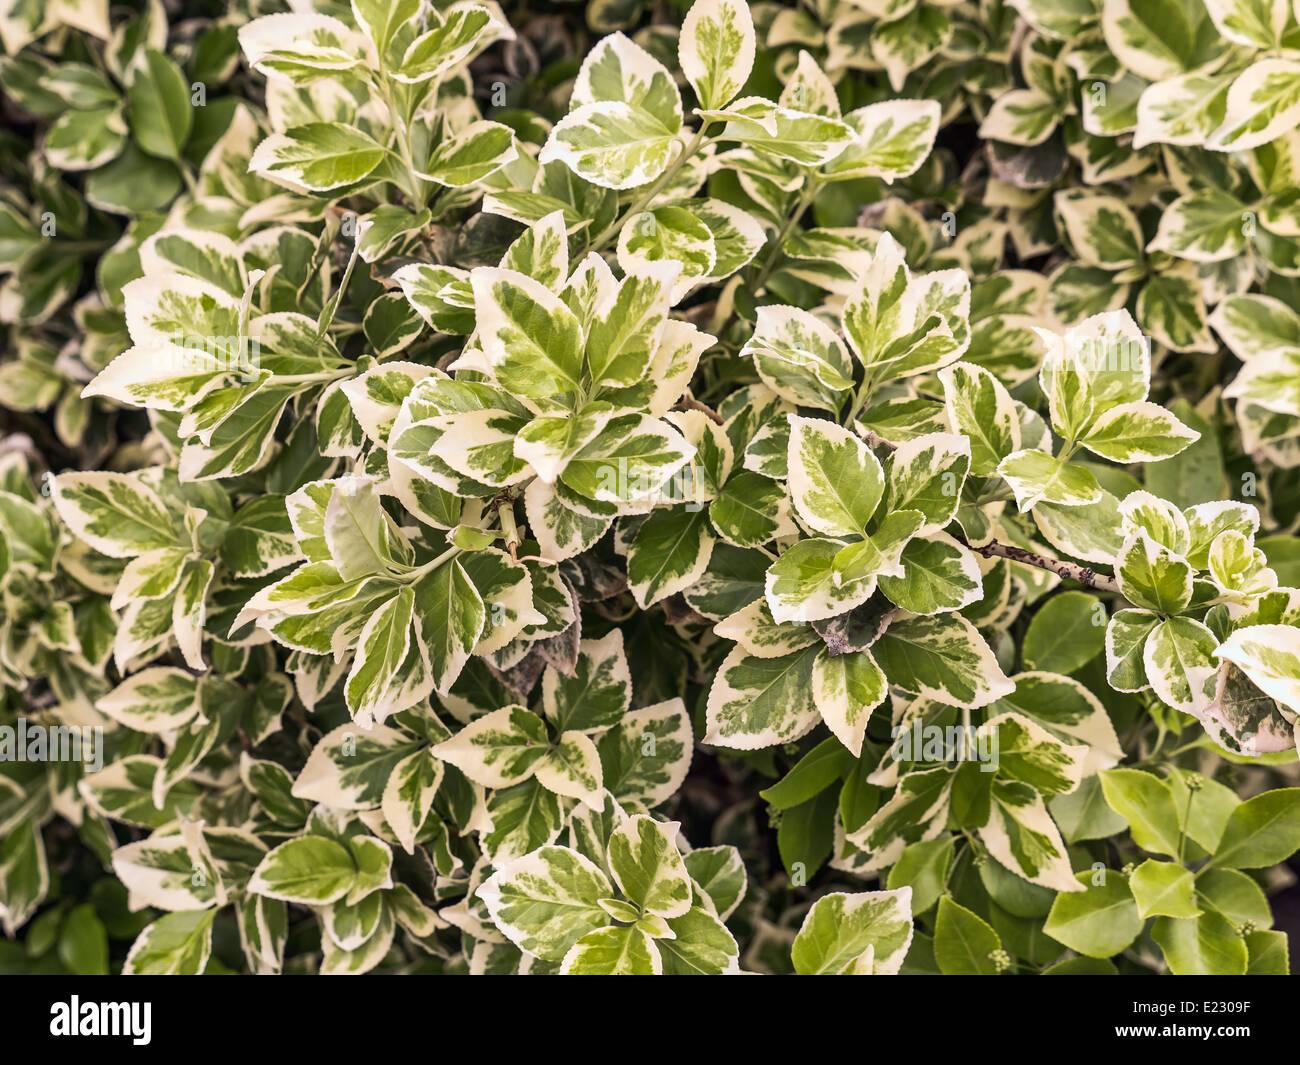 Closeup of winter creeper bush - Stock Image